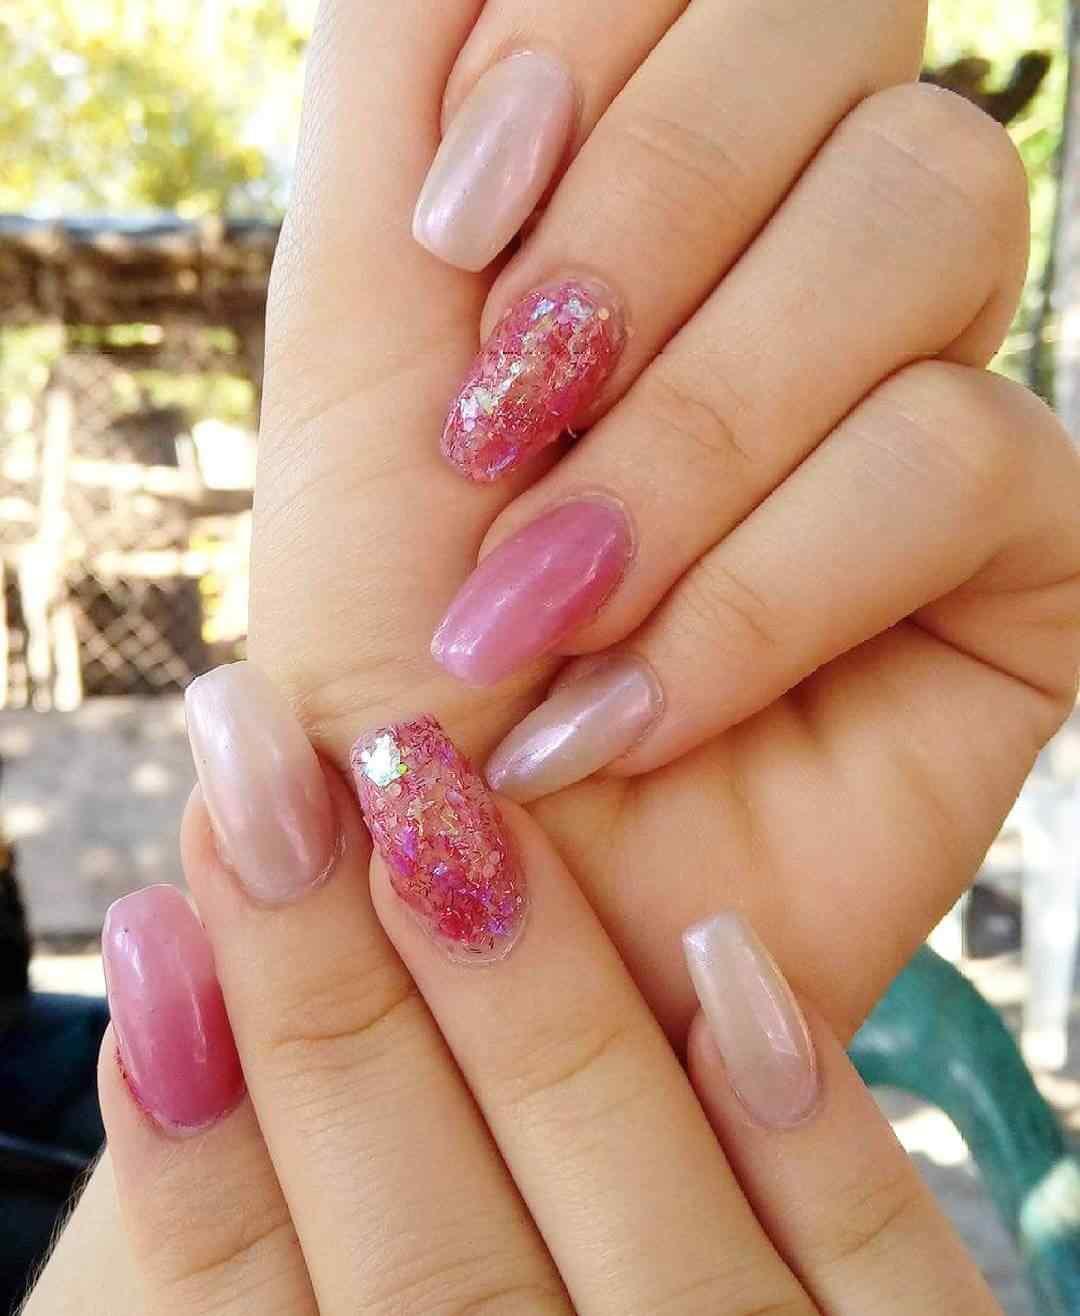 Uñas rosas con glitter